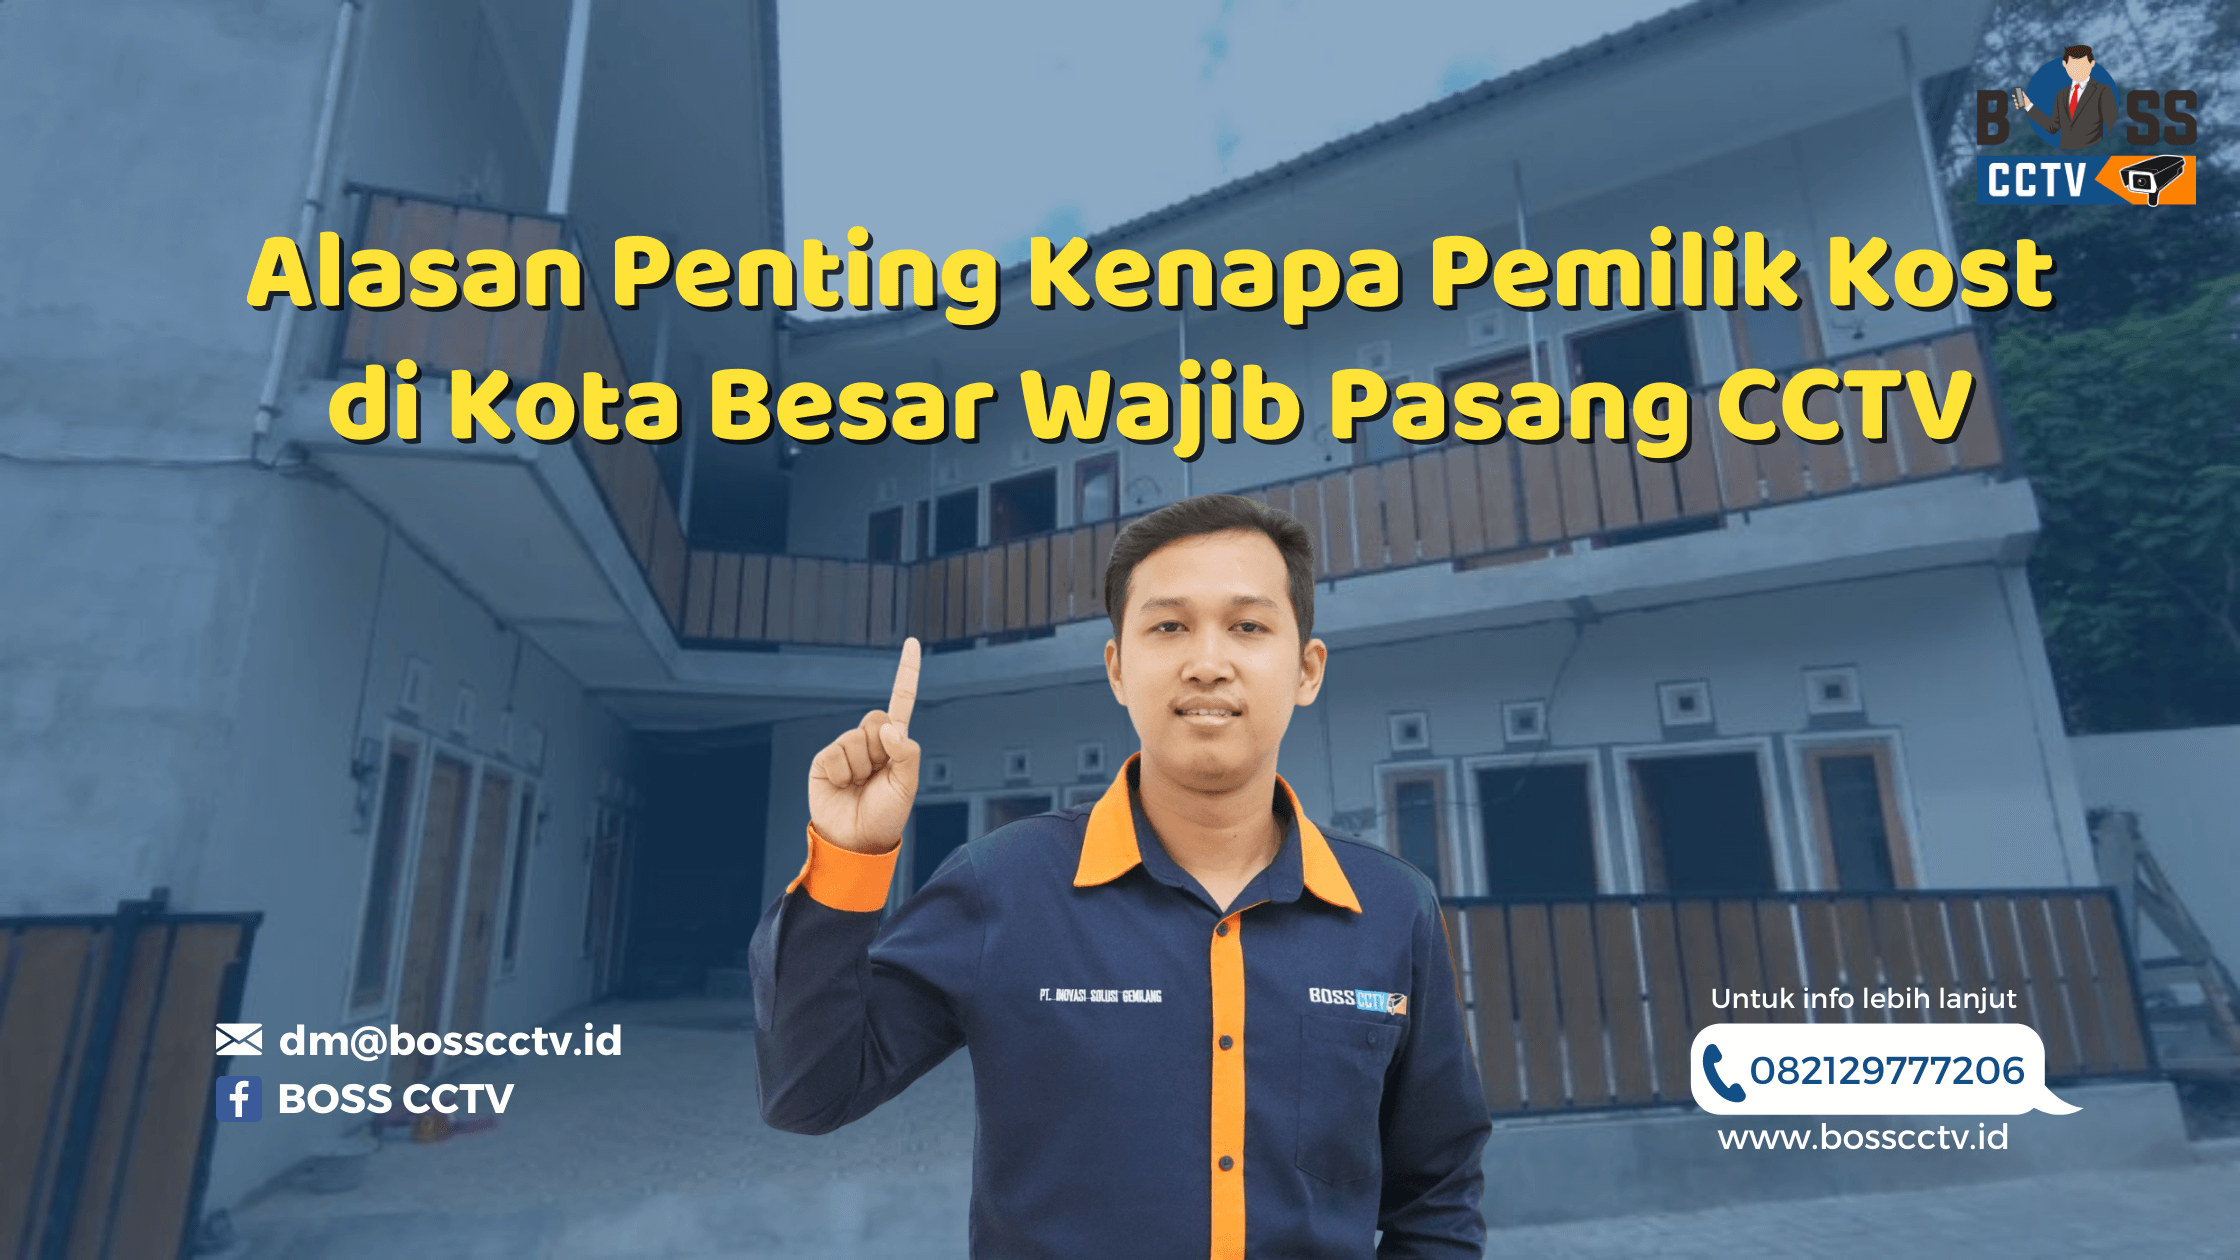 Alasan Penting Kenapa Pemilik Kost di Kota Besar Wajib Pasang CCTV